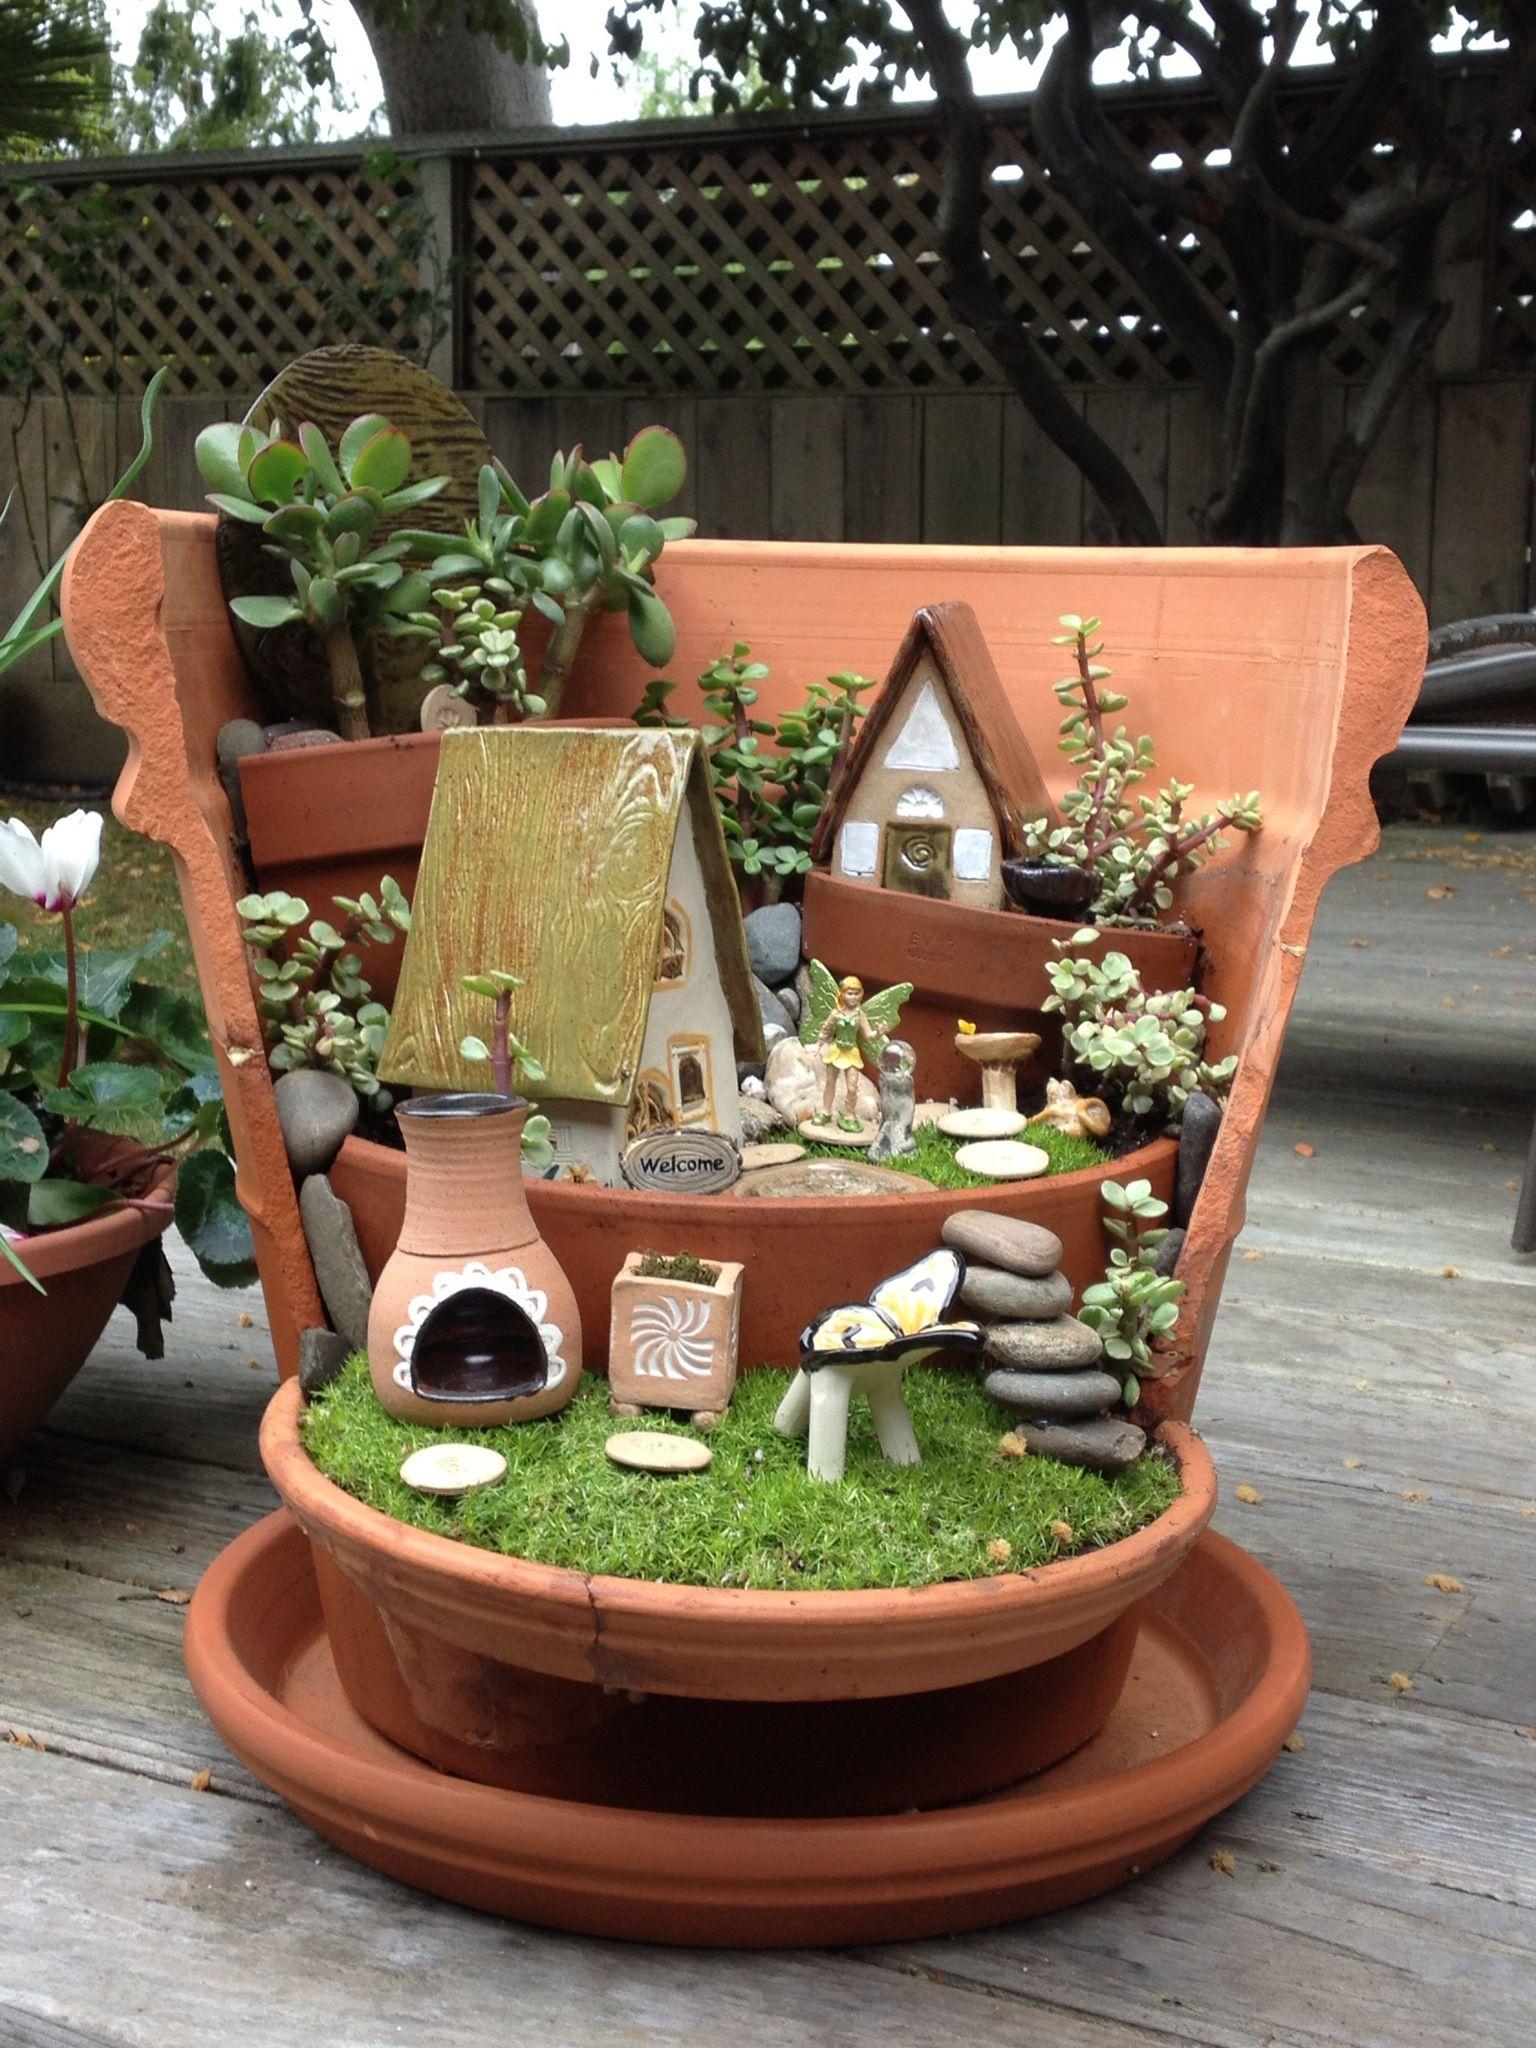 Un Jardin Nain Pour Petite Terrasse.   Mini Fairy Garden ... destiné Nain De Jardin Design